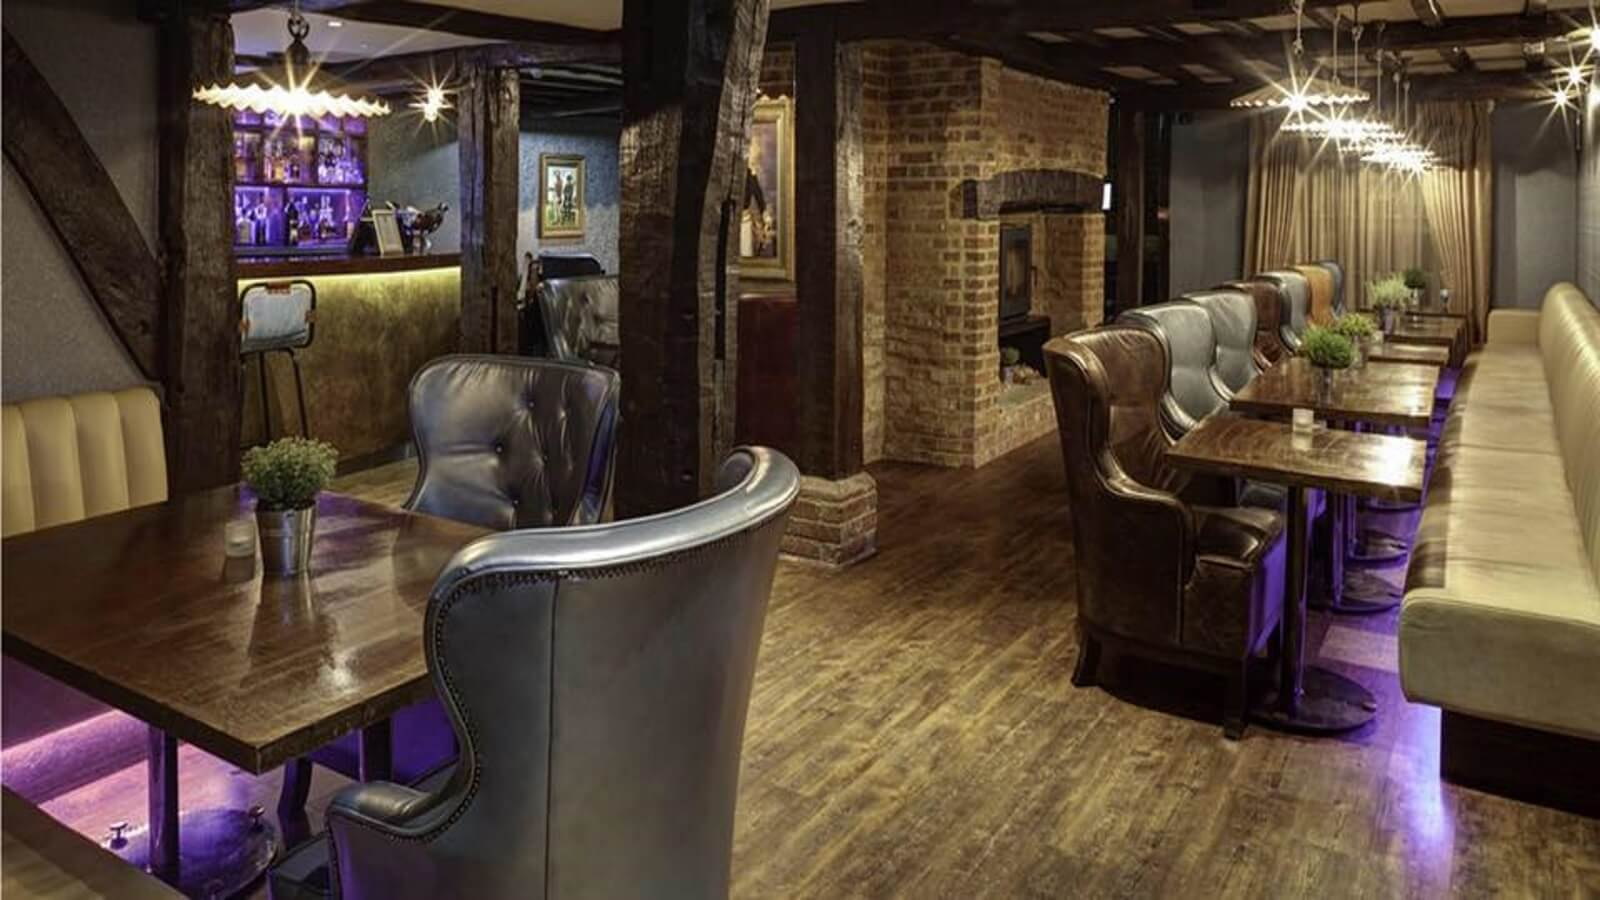 The Hengist Village Bar & Dining Rooms